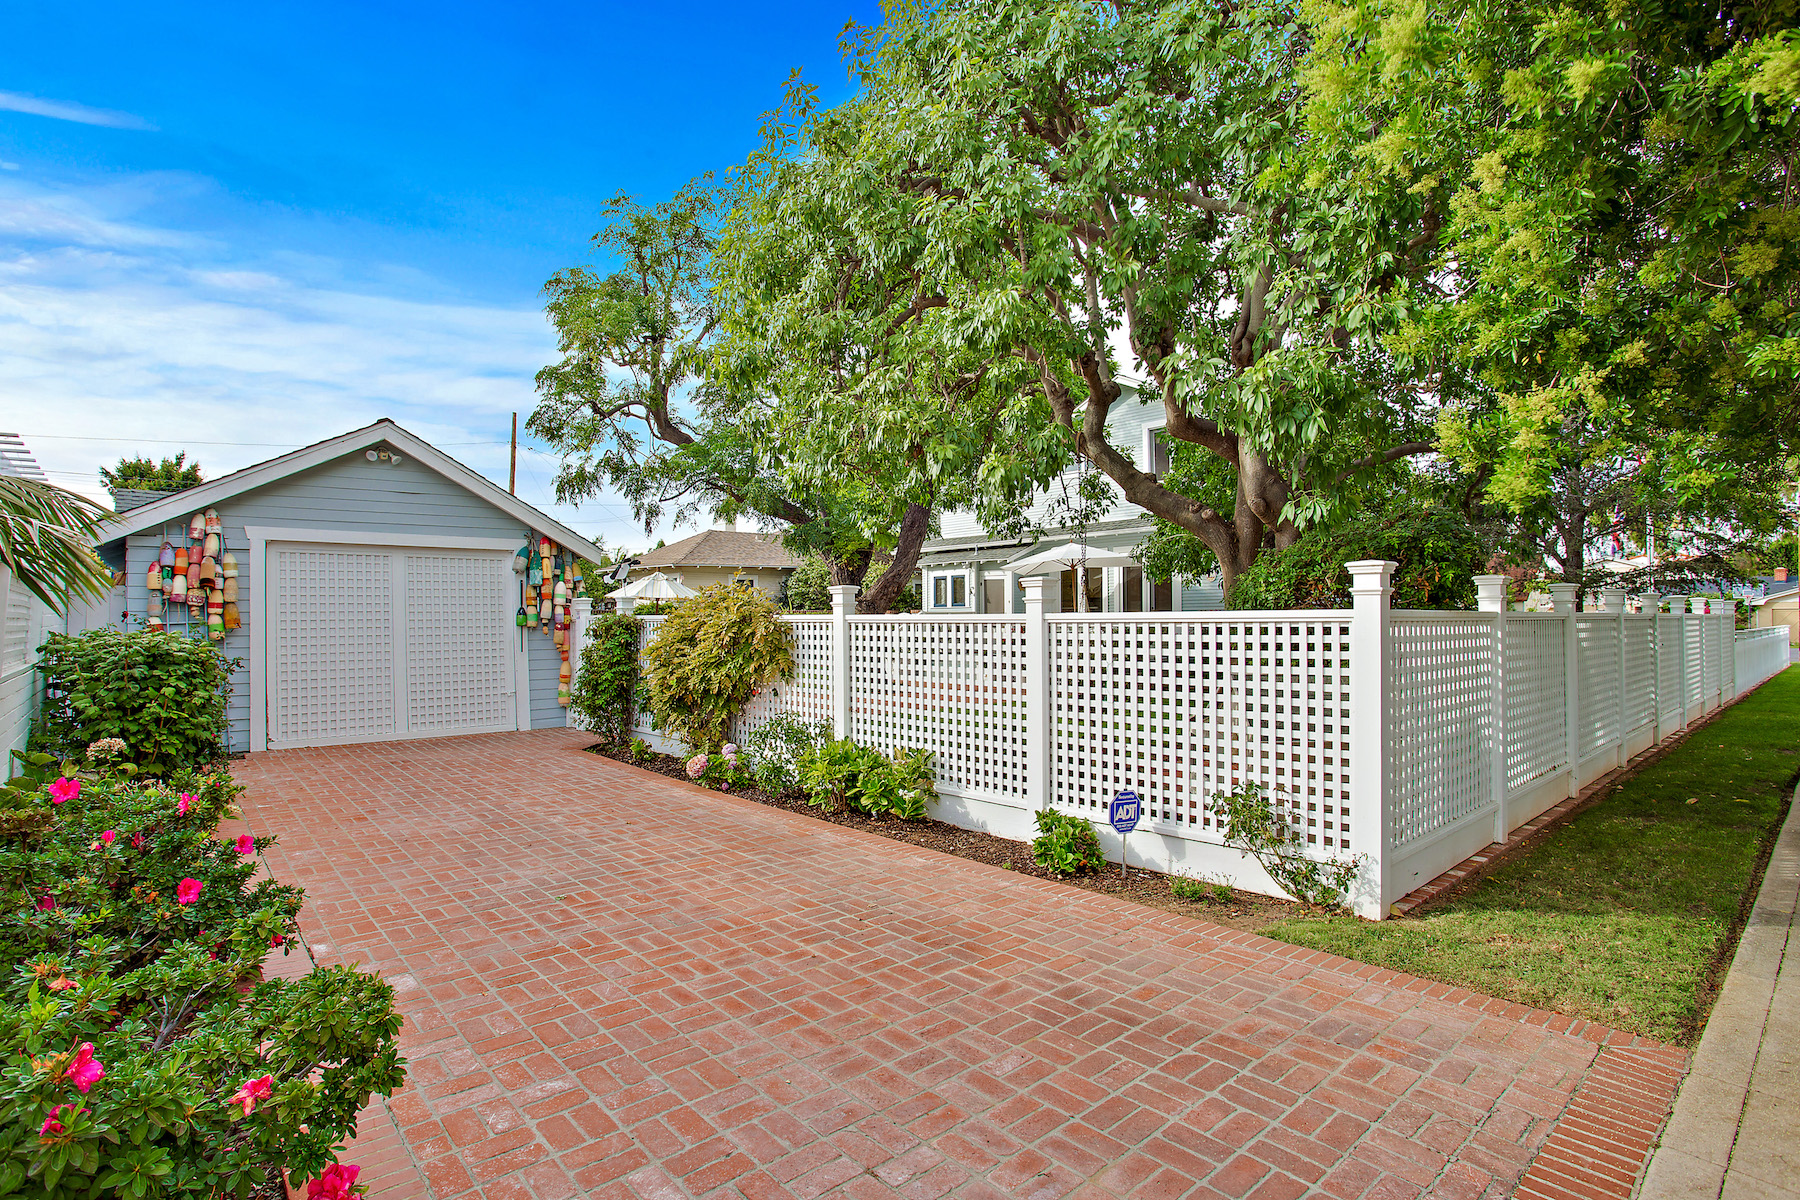 Additional photo for property listing at 624 1st Street  Coronado, Californie 92118 États-Unis